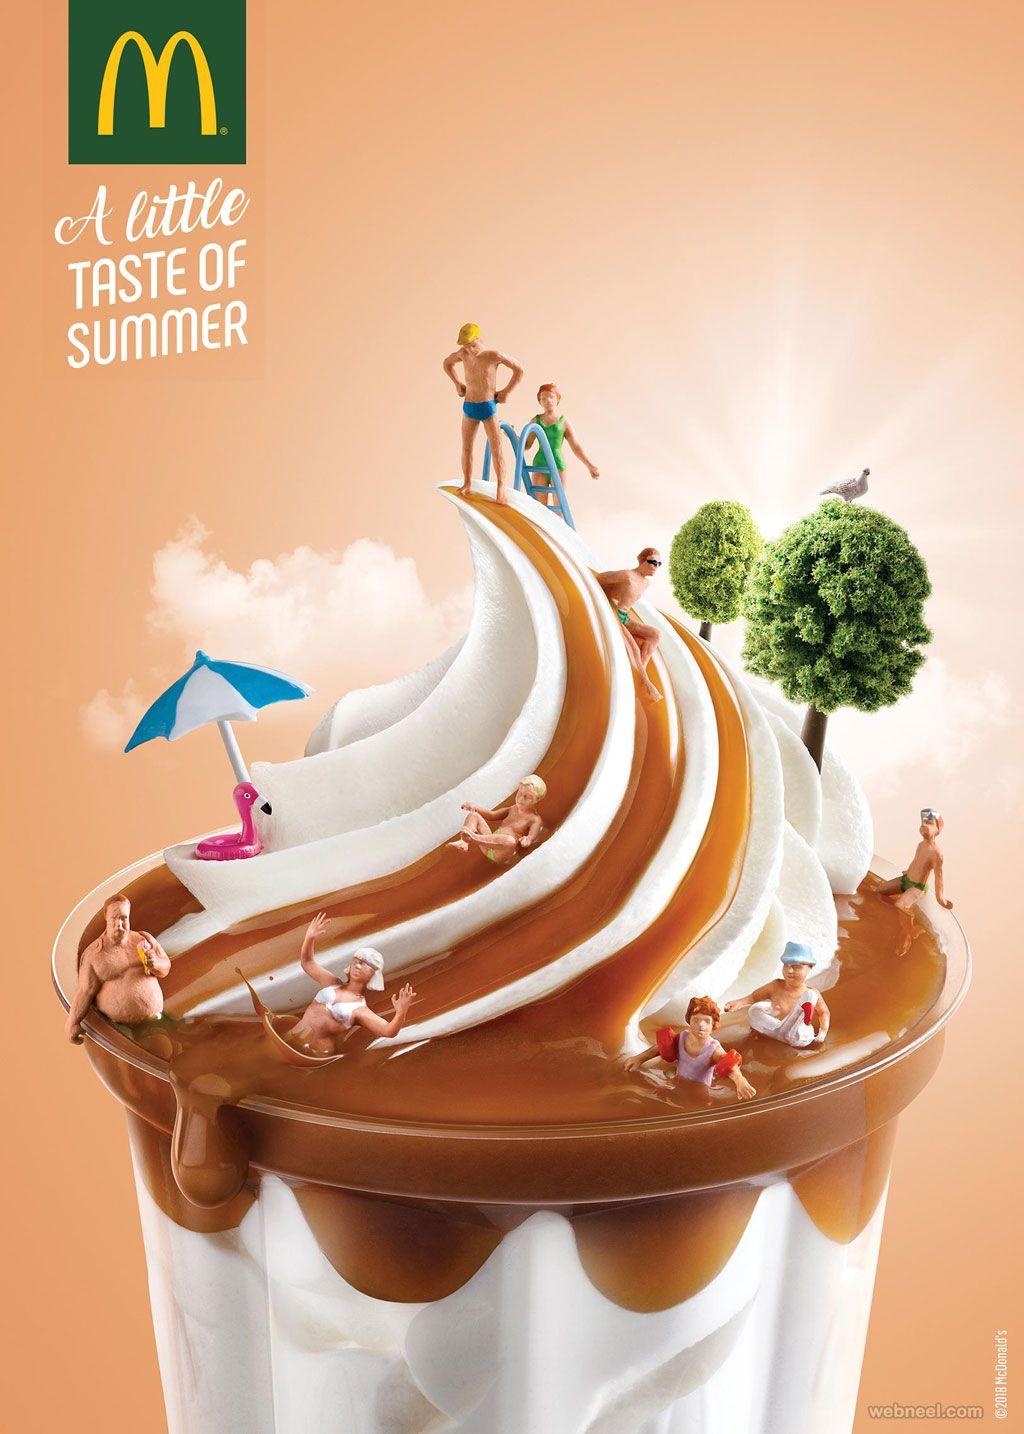 print advertisement mcdonald icecream 음식 포스터, 광고 디자인, 사진